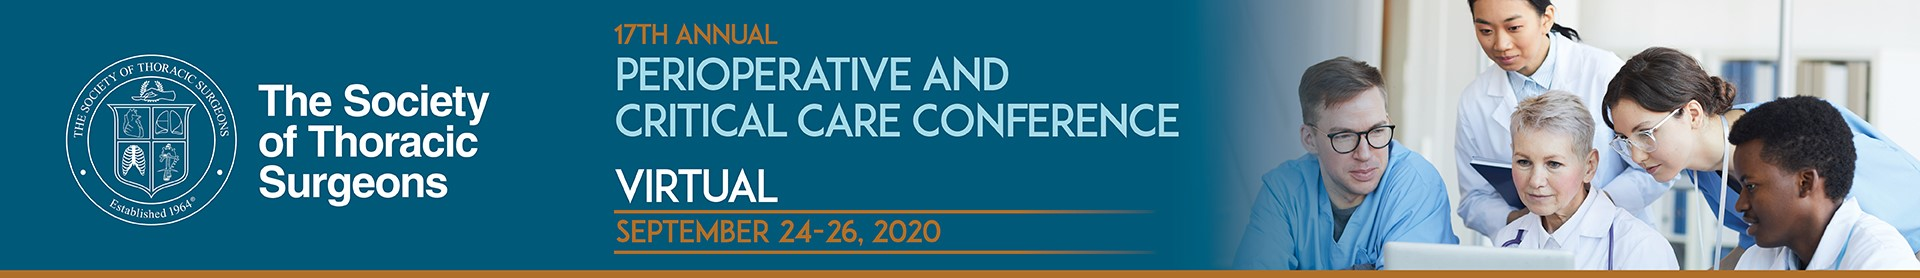 STS 17th Annual Perioperative Critical Care Conference Event Banner